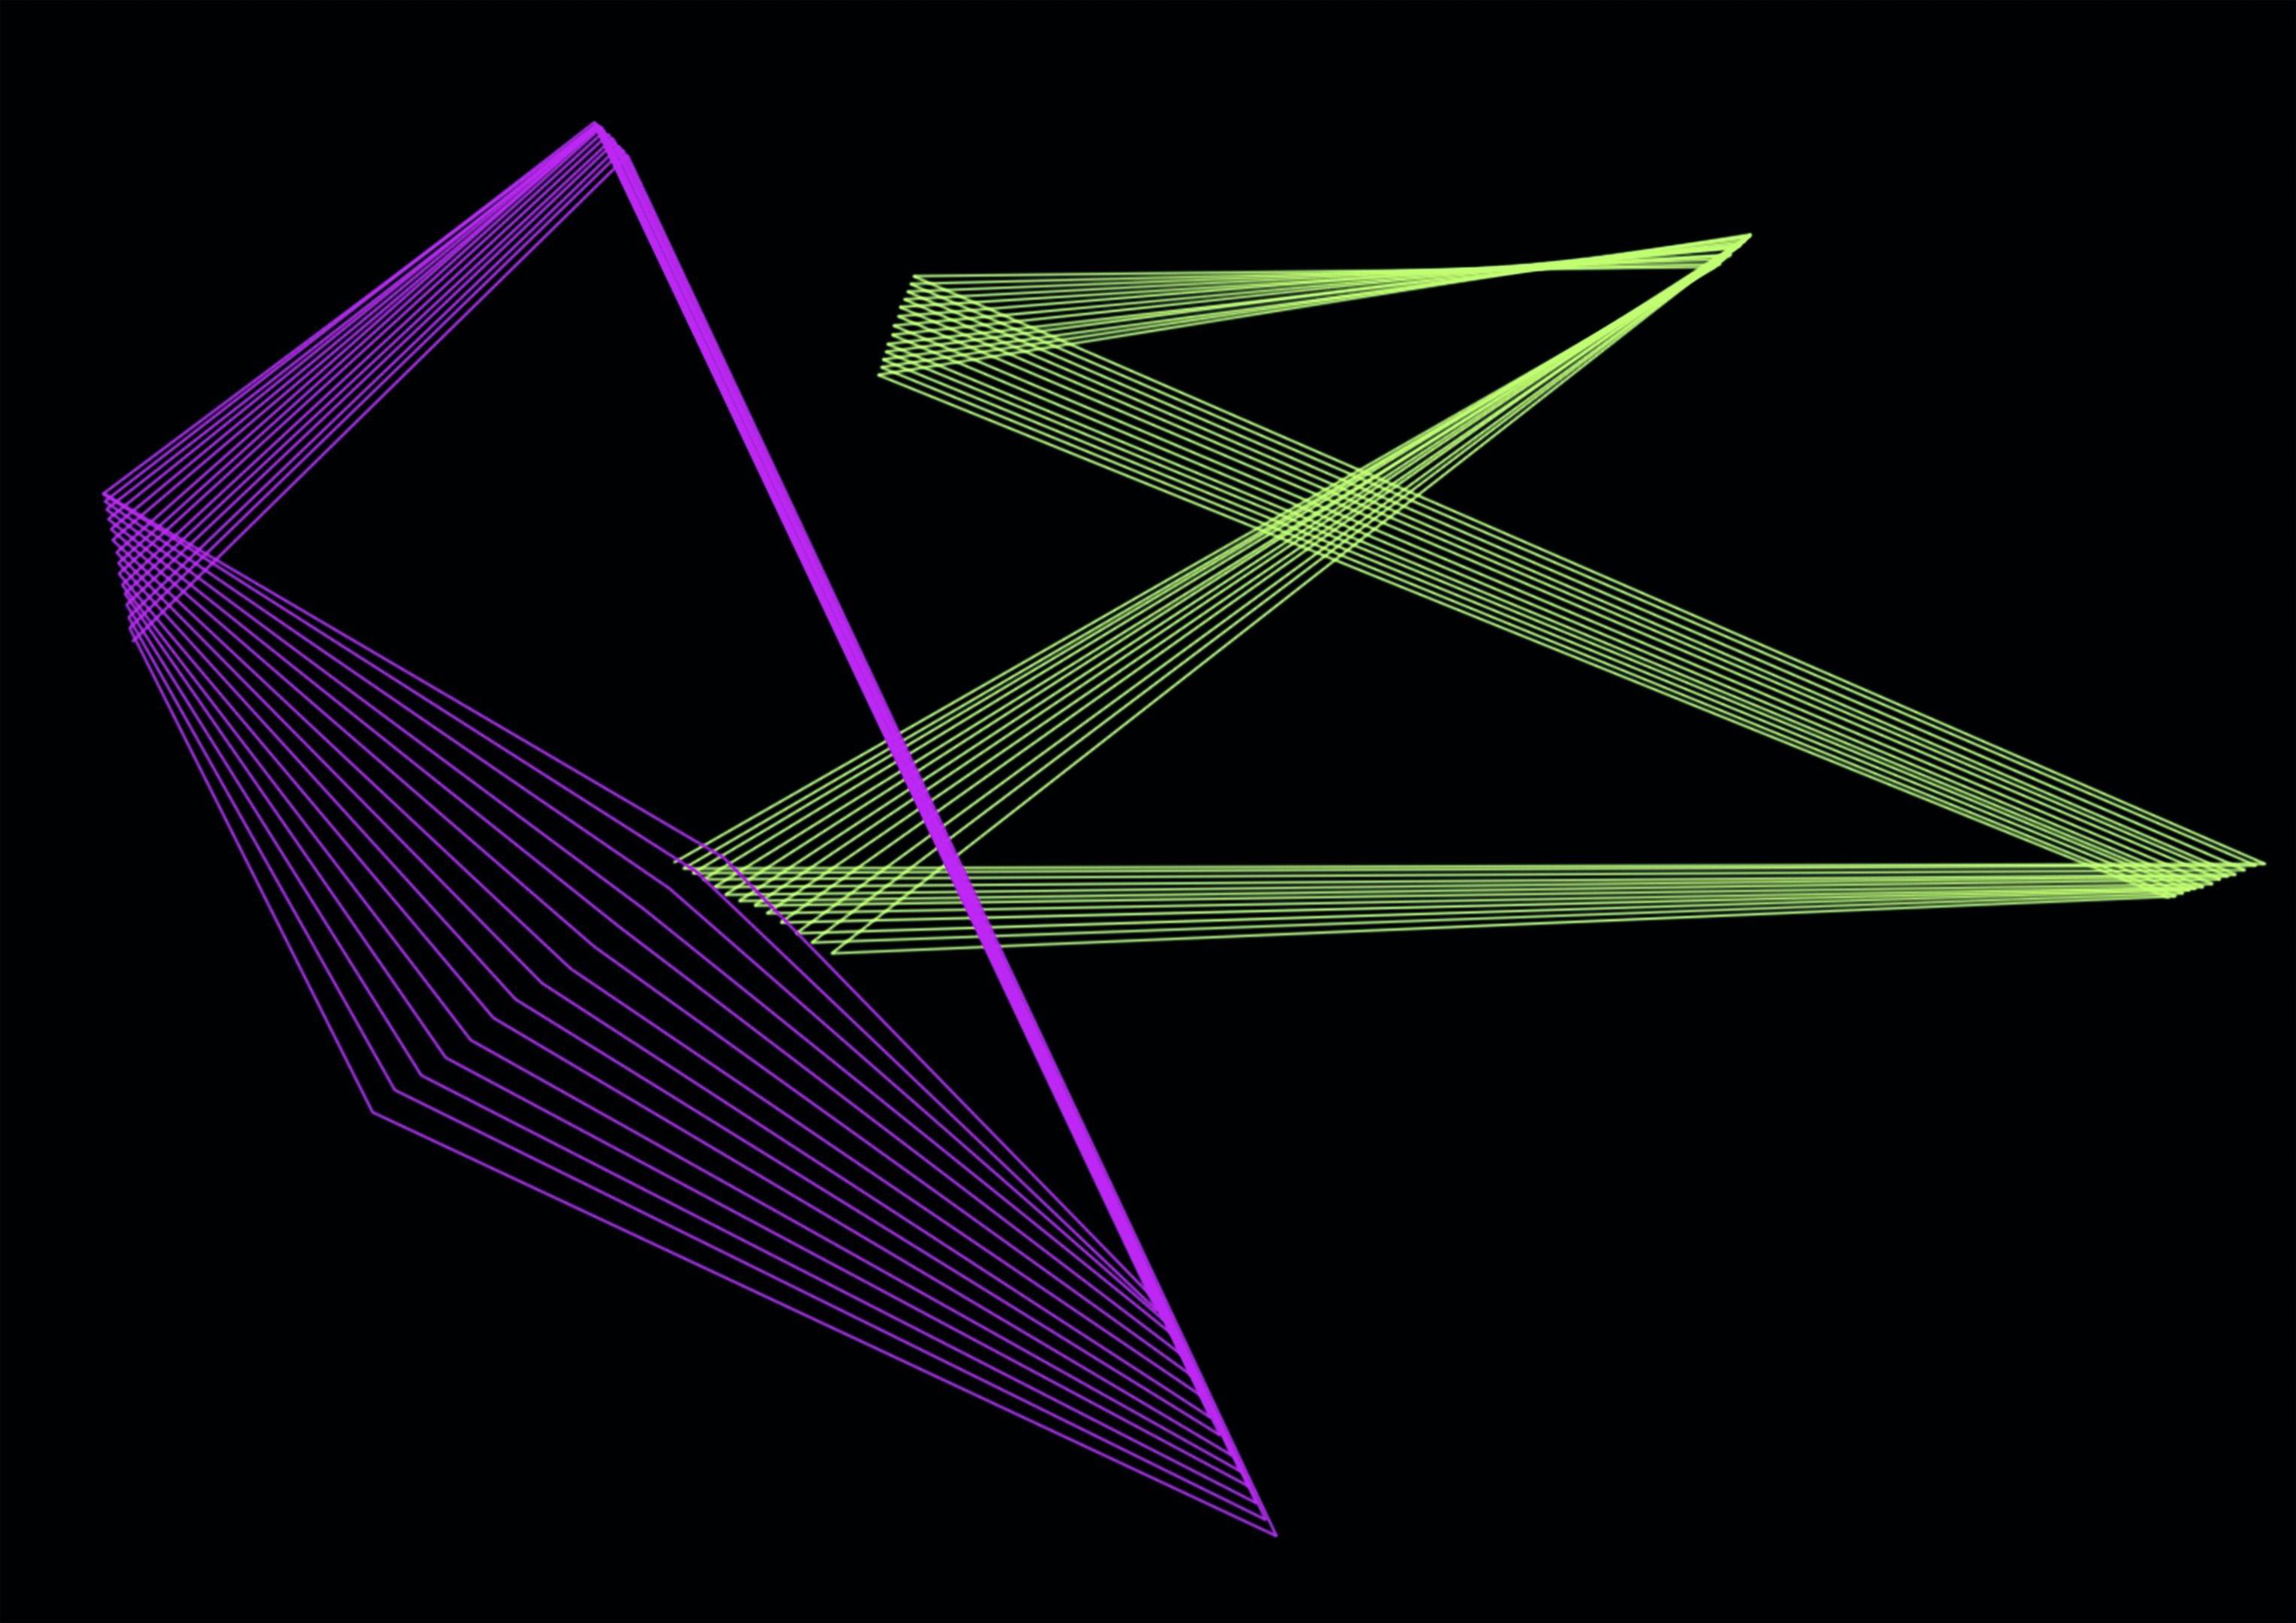 Wallpapers Screensavers Windows XP (45+ images)